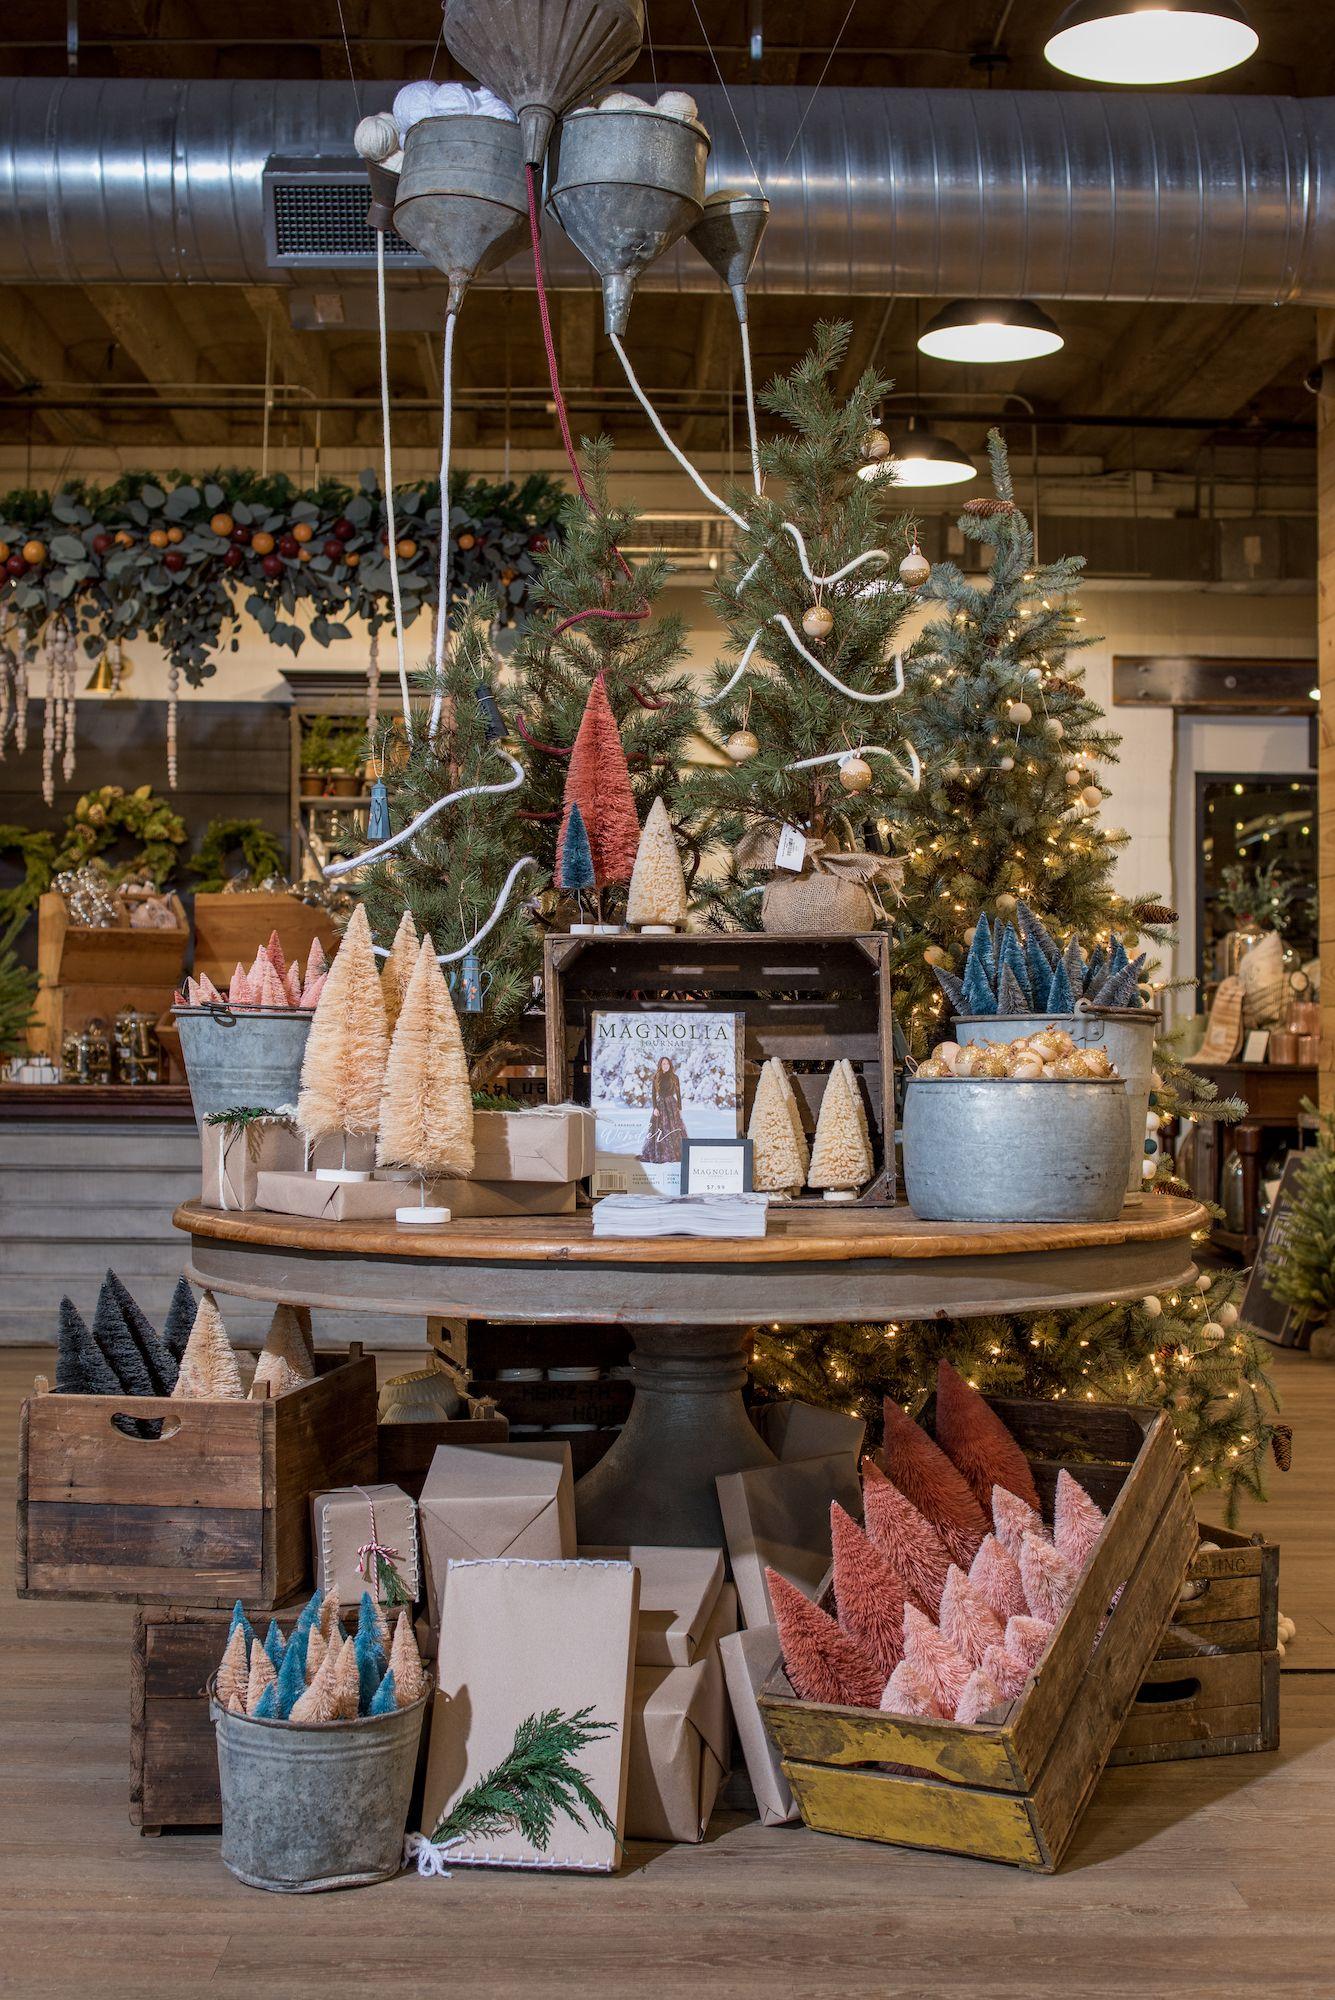 Magnolia Farms Christmas 2020 Winter install at Magnolia Market | Christmas shop displays